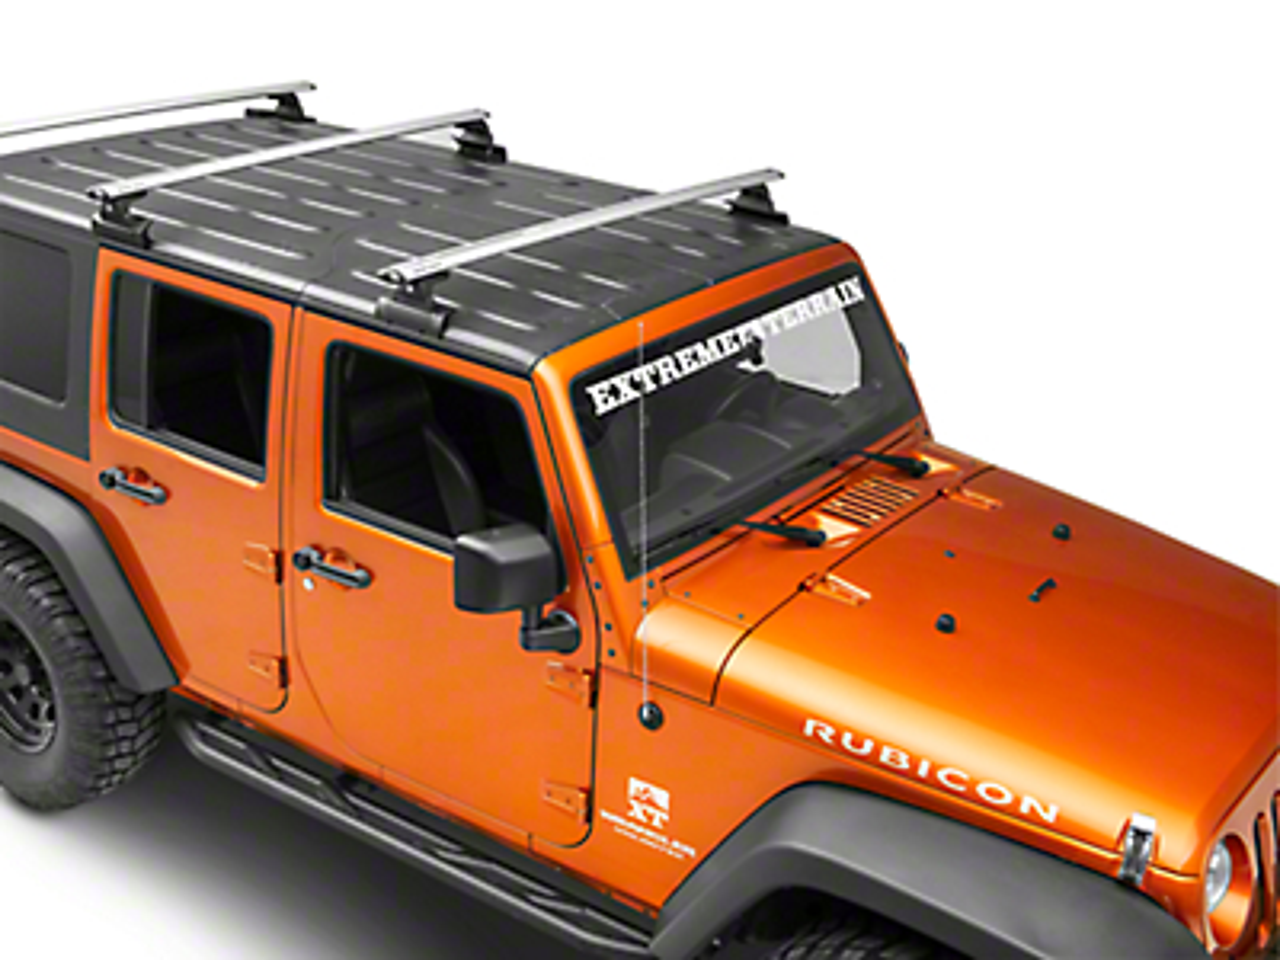 Rhino-Rack Vortex RLT600 3-Bar Backbone Roof Rack - Silver (07-18 Jeep Wrangler JK 4 Door)